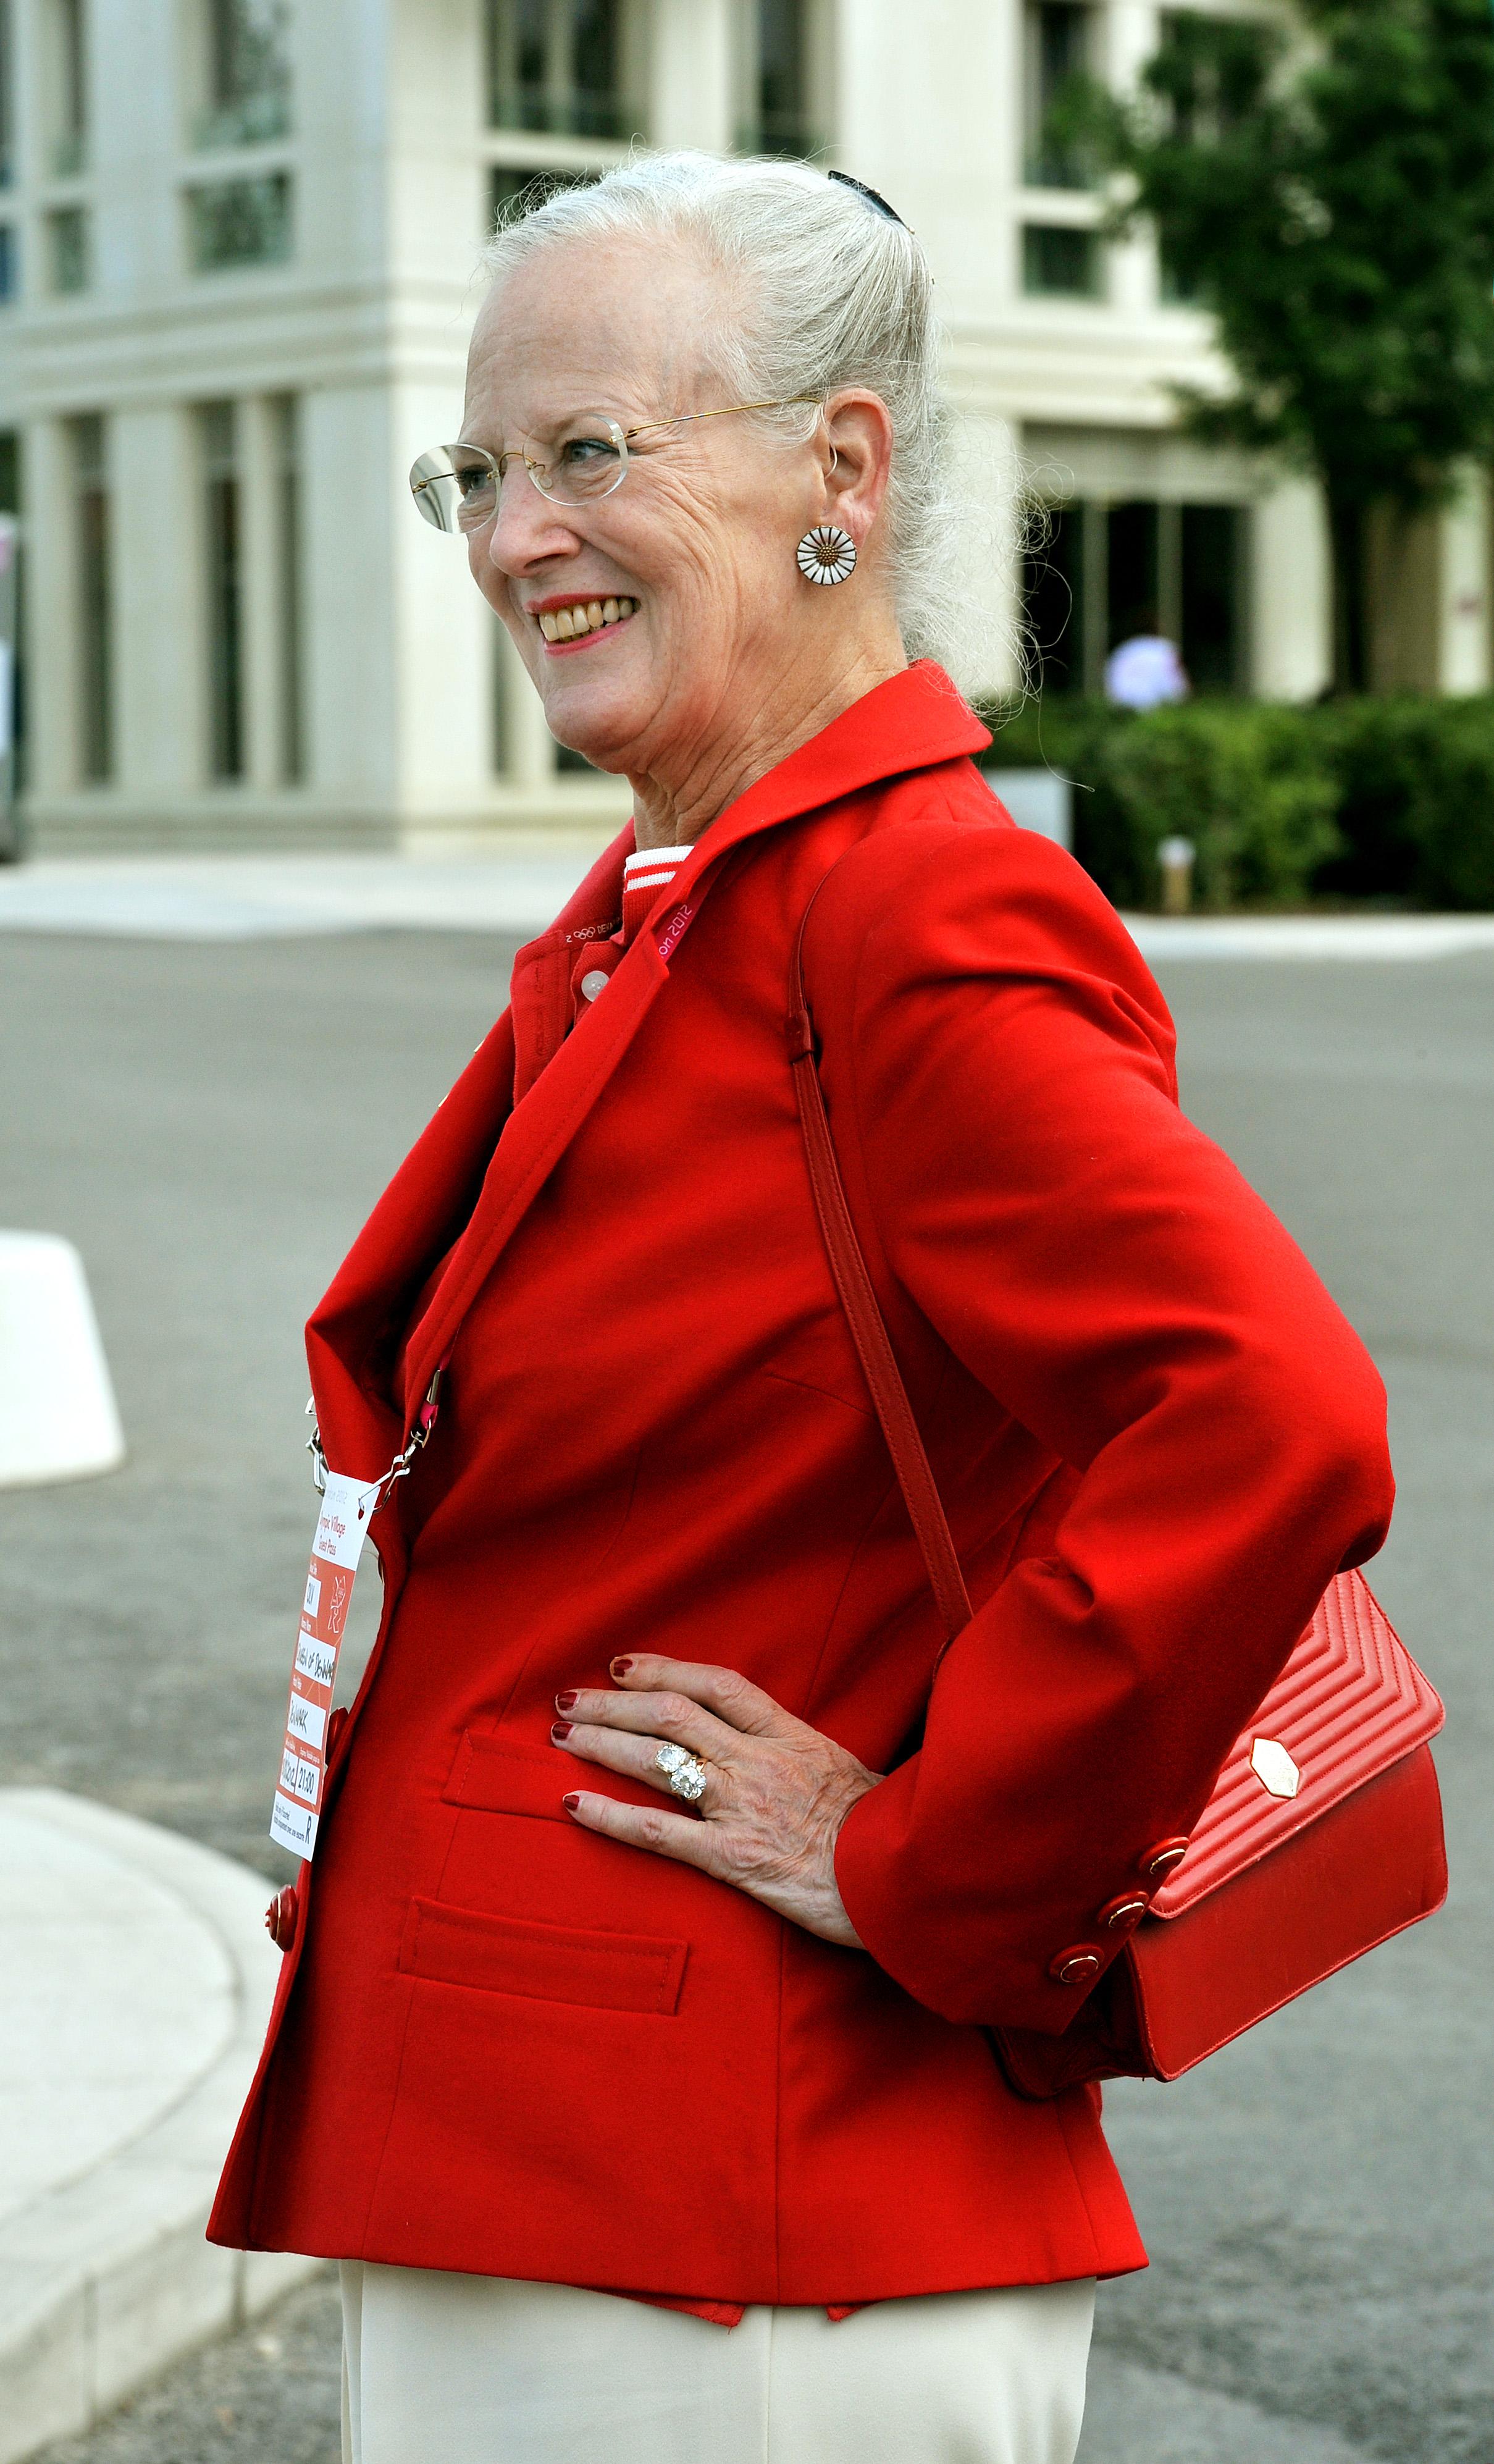 Кралица Маргрете действа и като сценограф и дизайнер на костюми към Кралския датски балет.